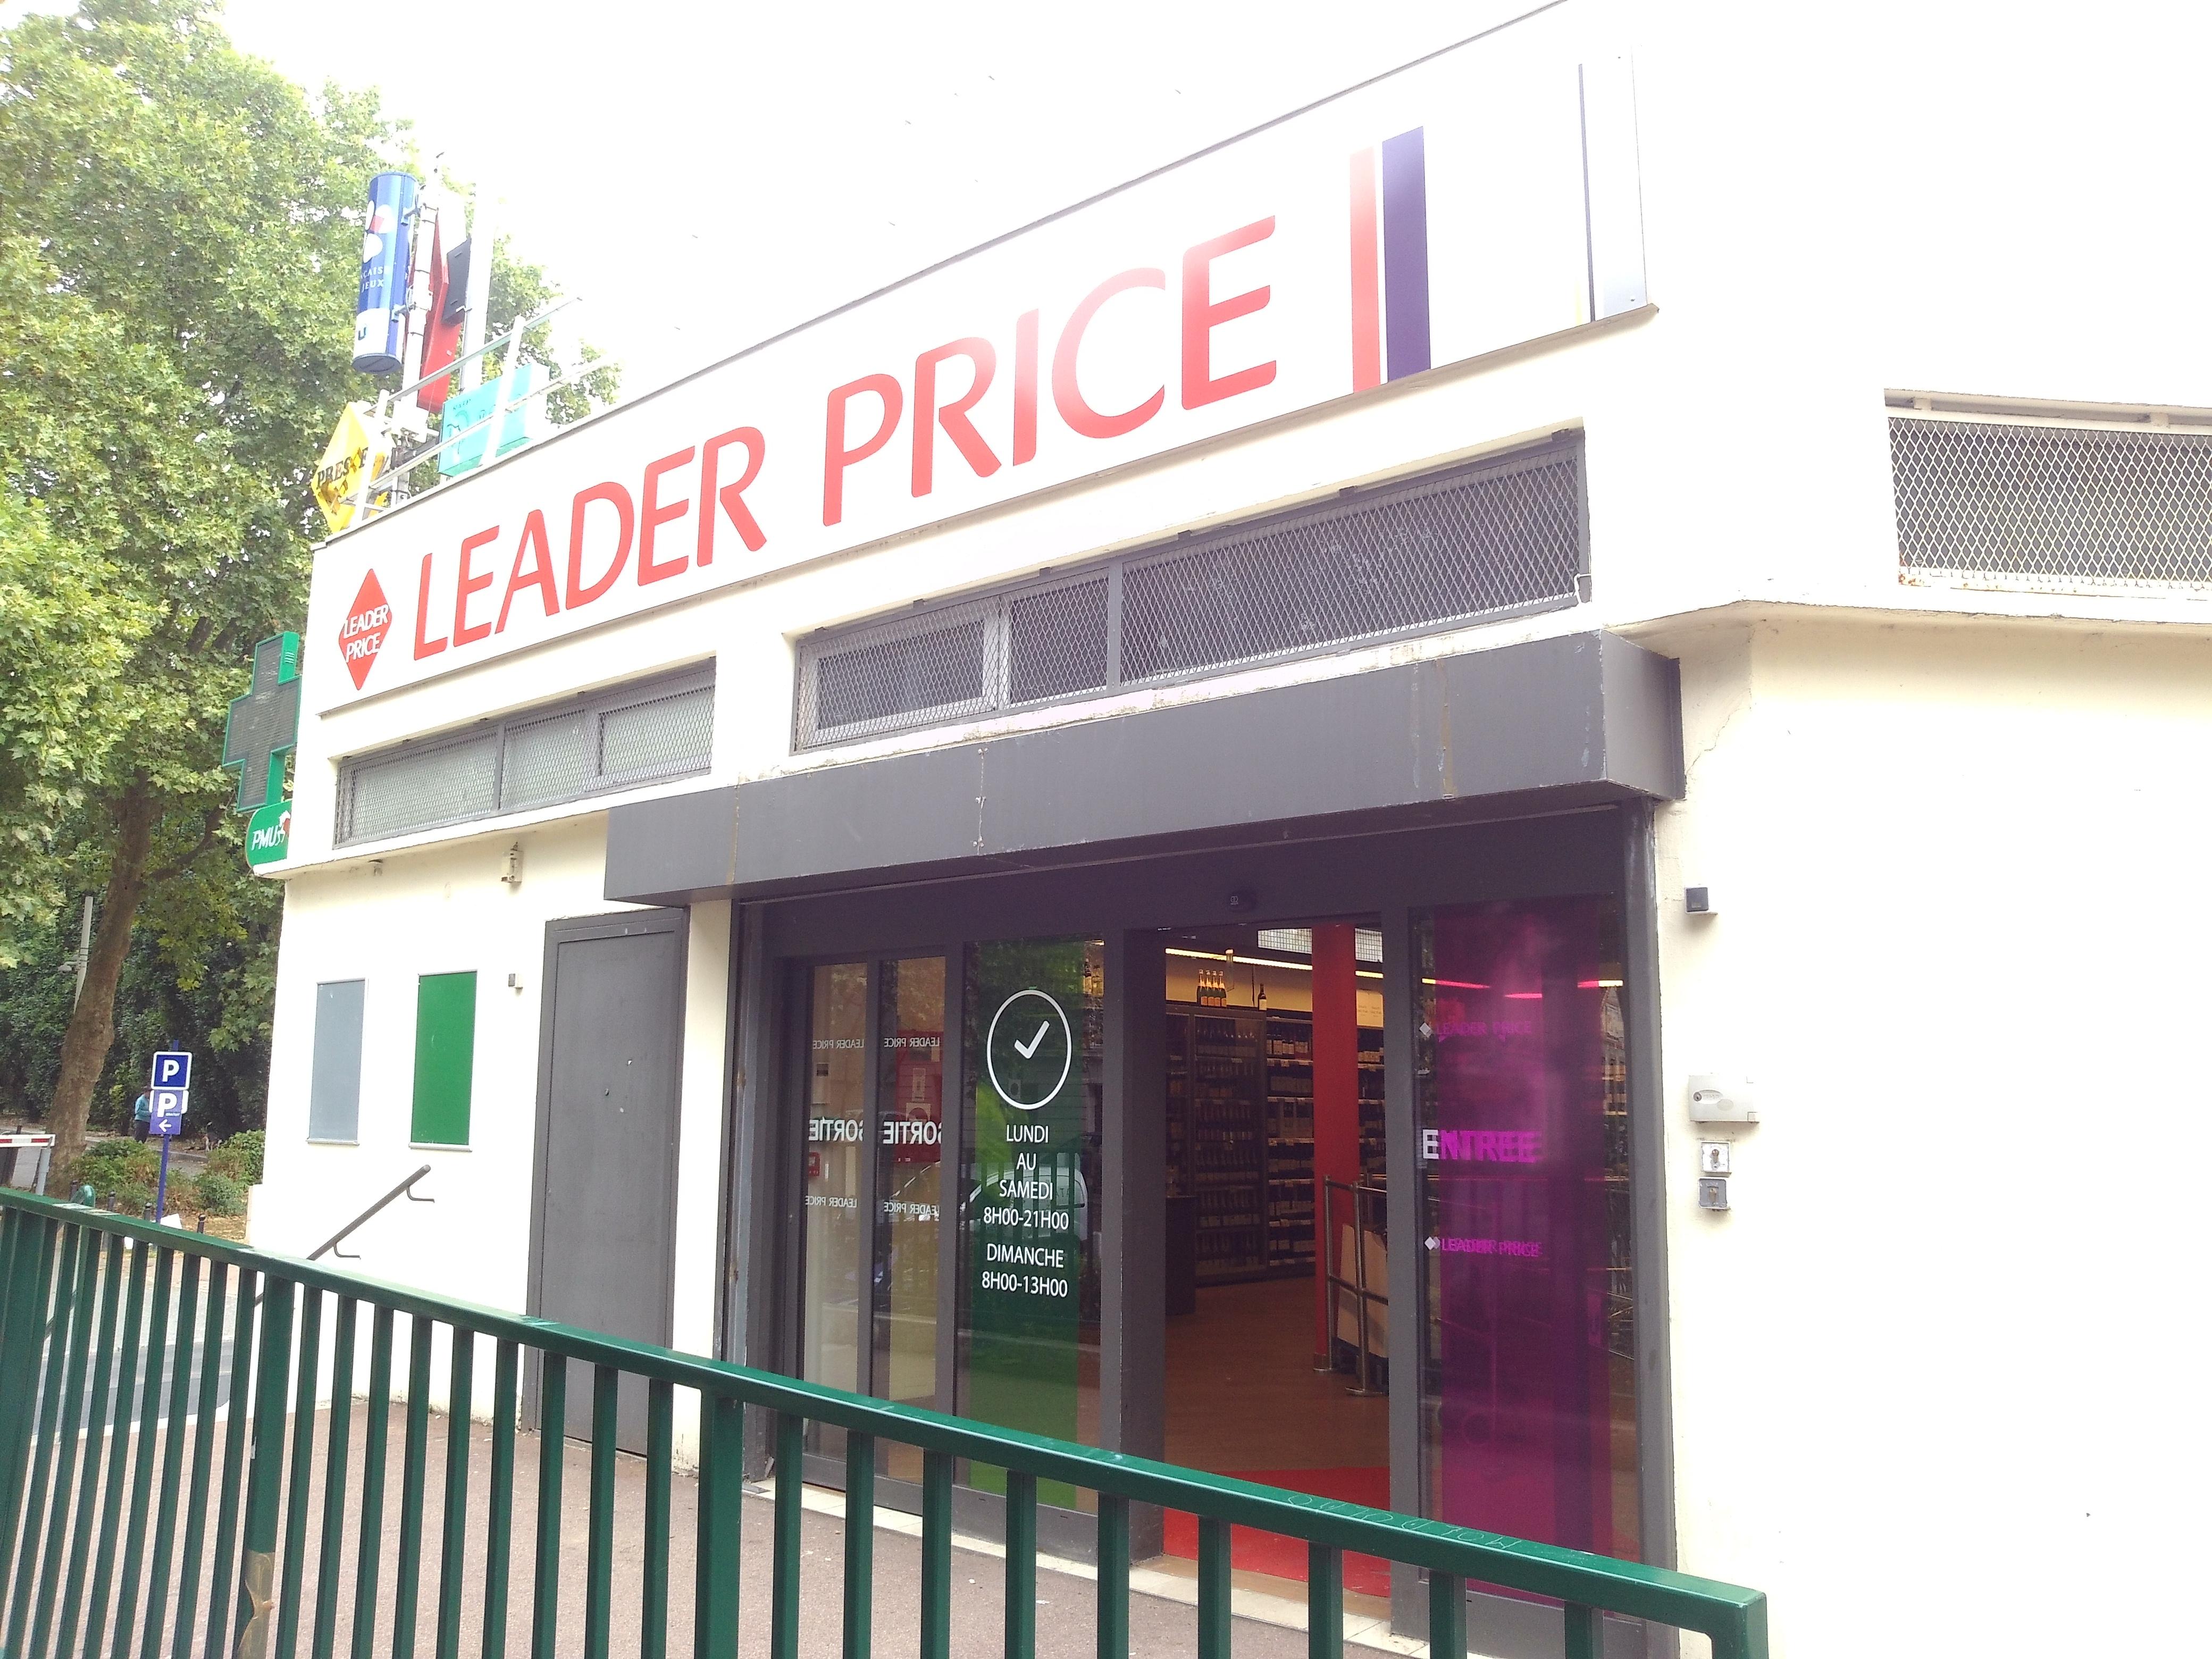 Leader Price Gentilly